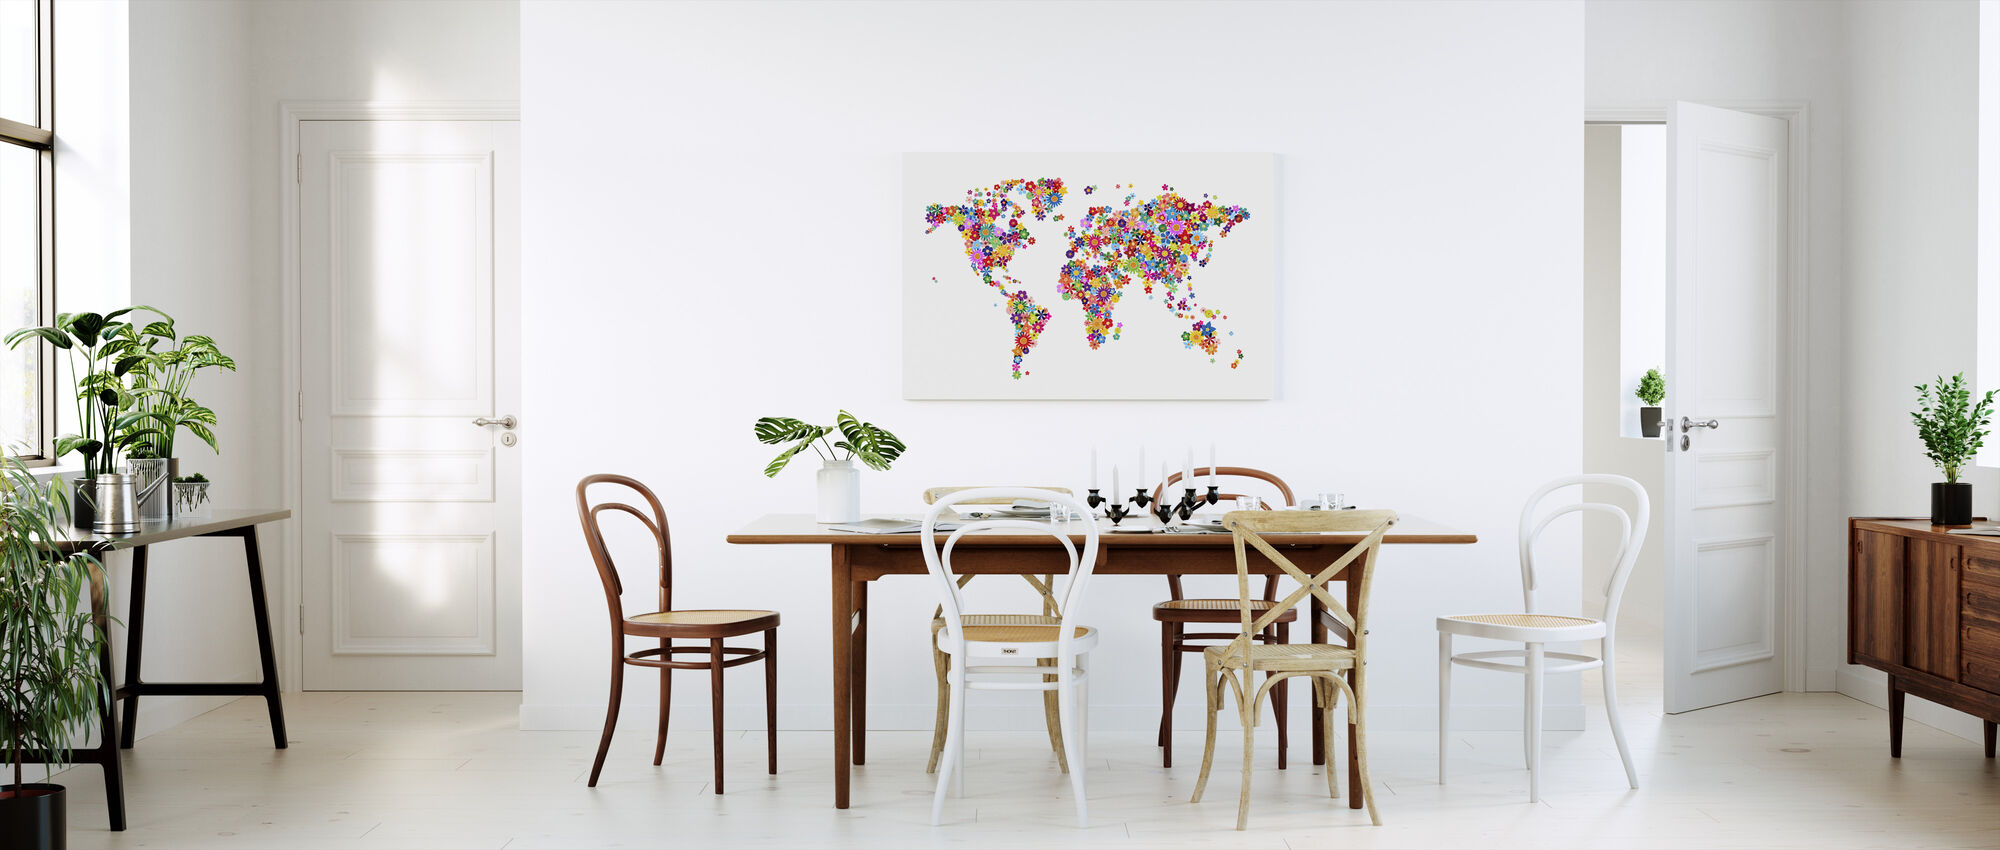 Blumen Weltkarte - Leinwandbild - Küchen